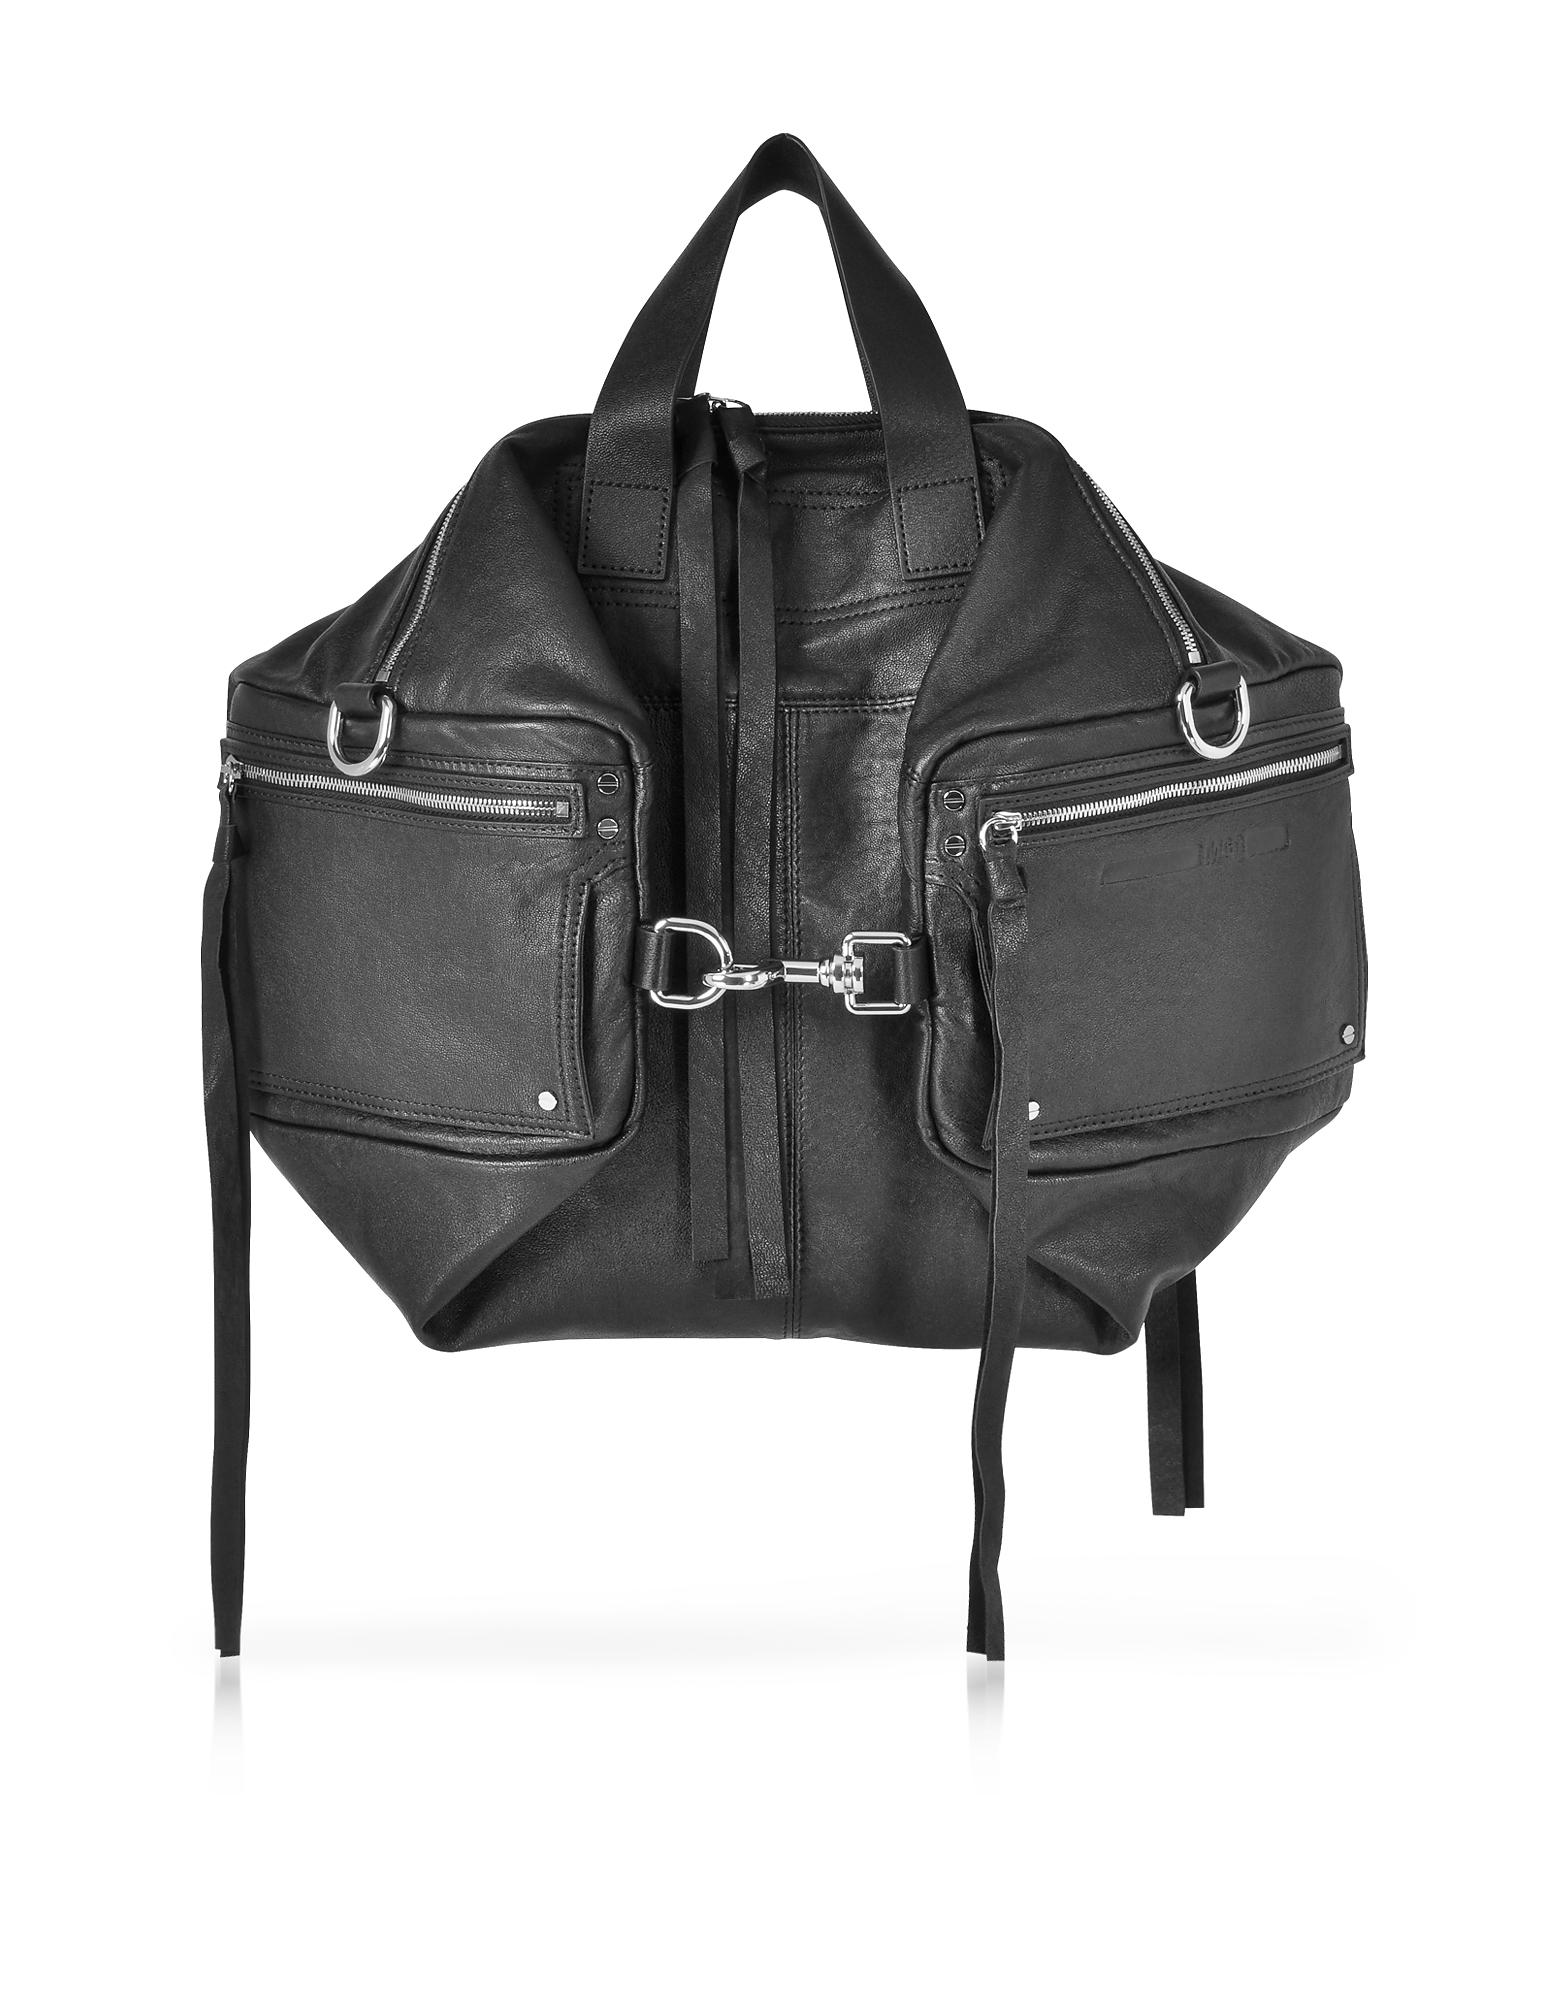 McQ Alexander McQueen Handbags, Loveless Black Leather Convertible Holdall